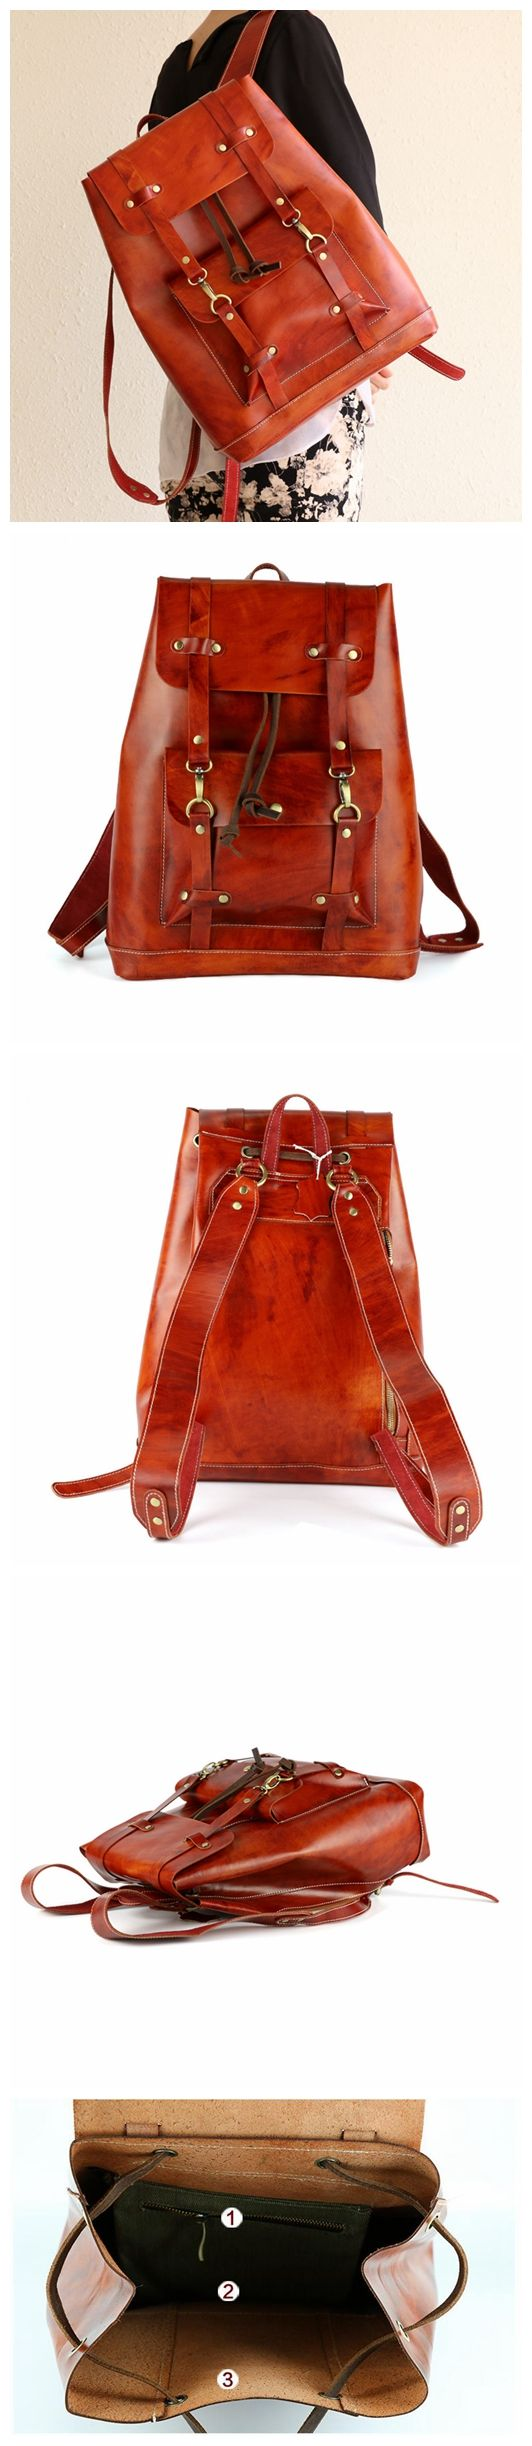 Fashion Women Leather Backpack Travel Bookbag High Quality Ladies Backpacks 6198